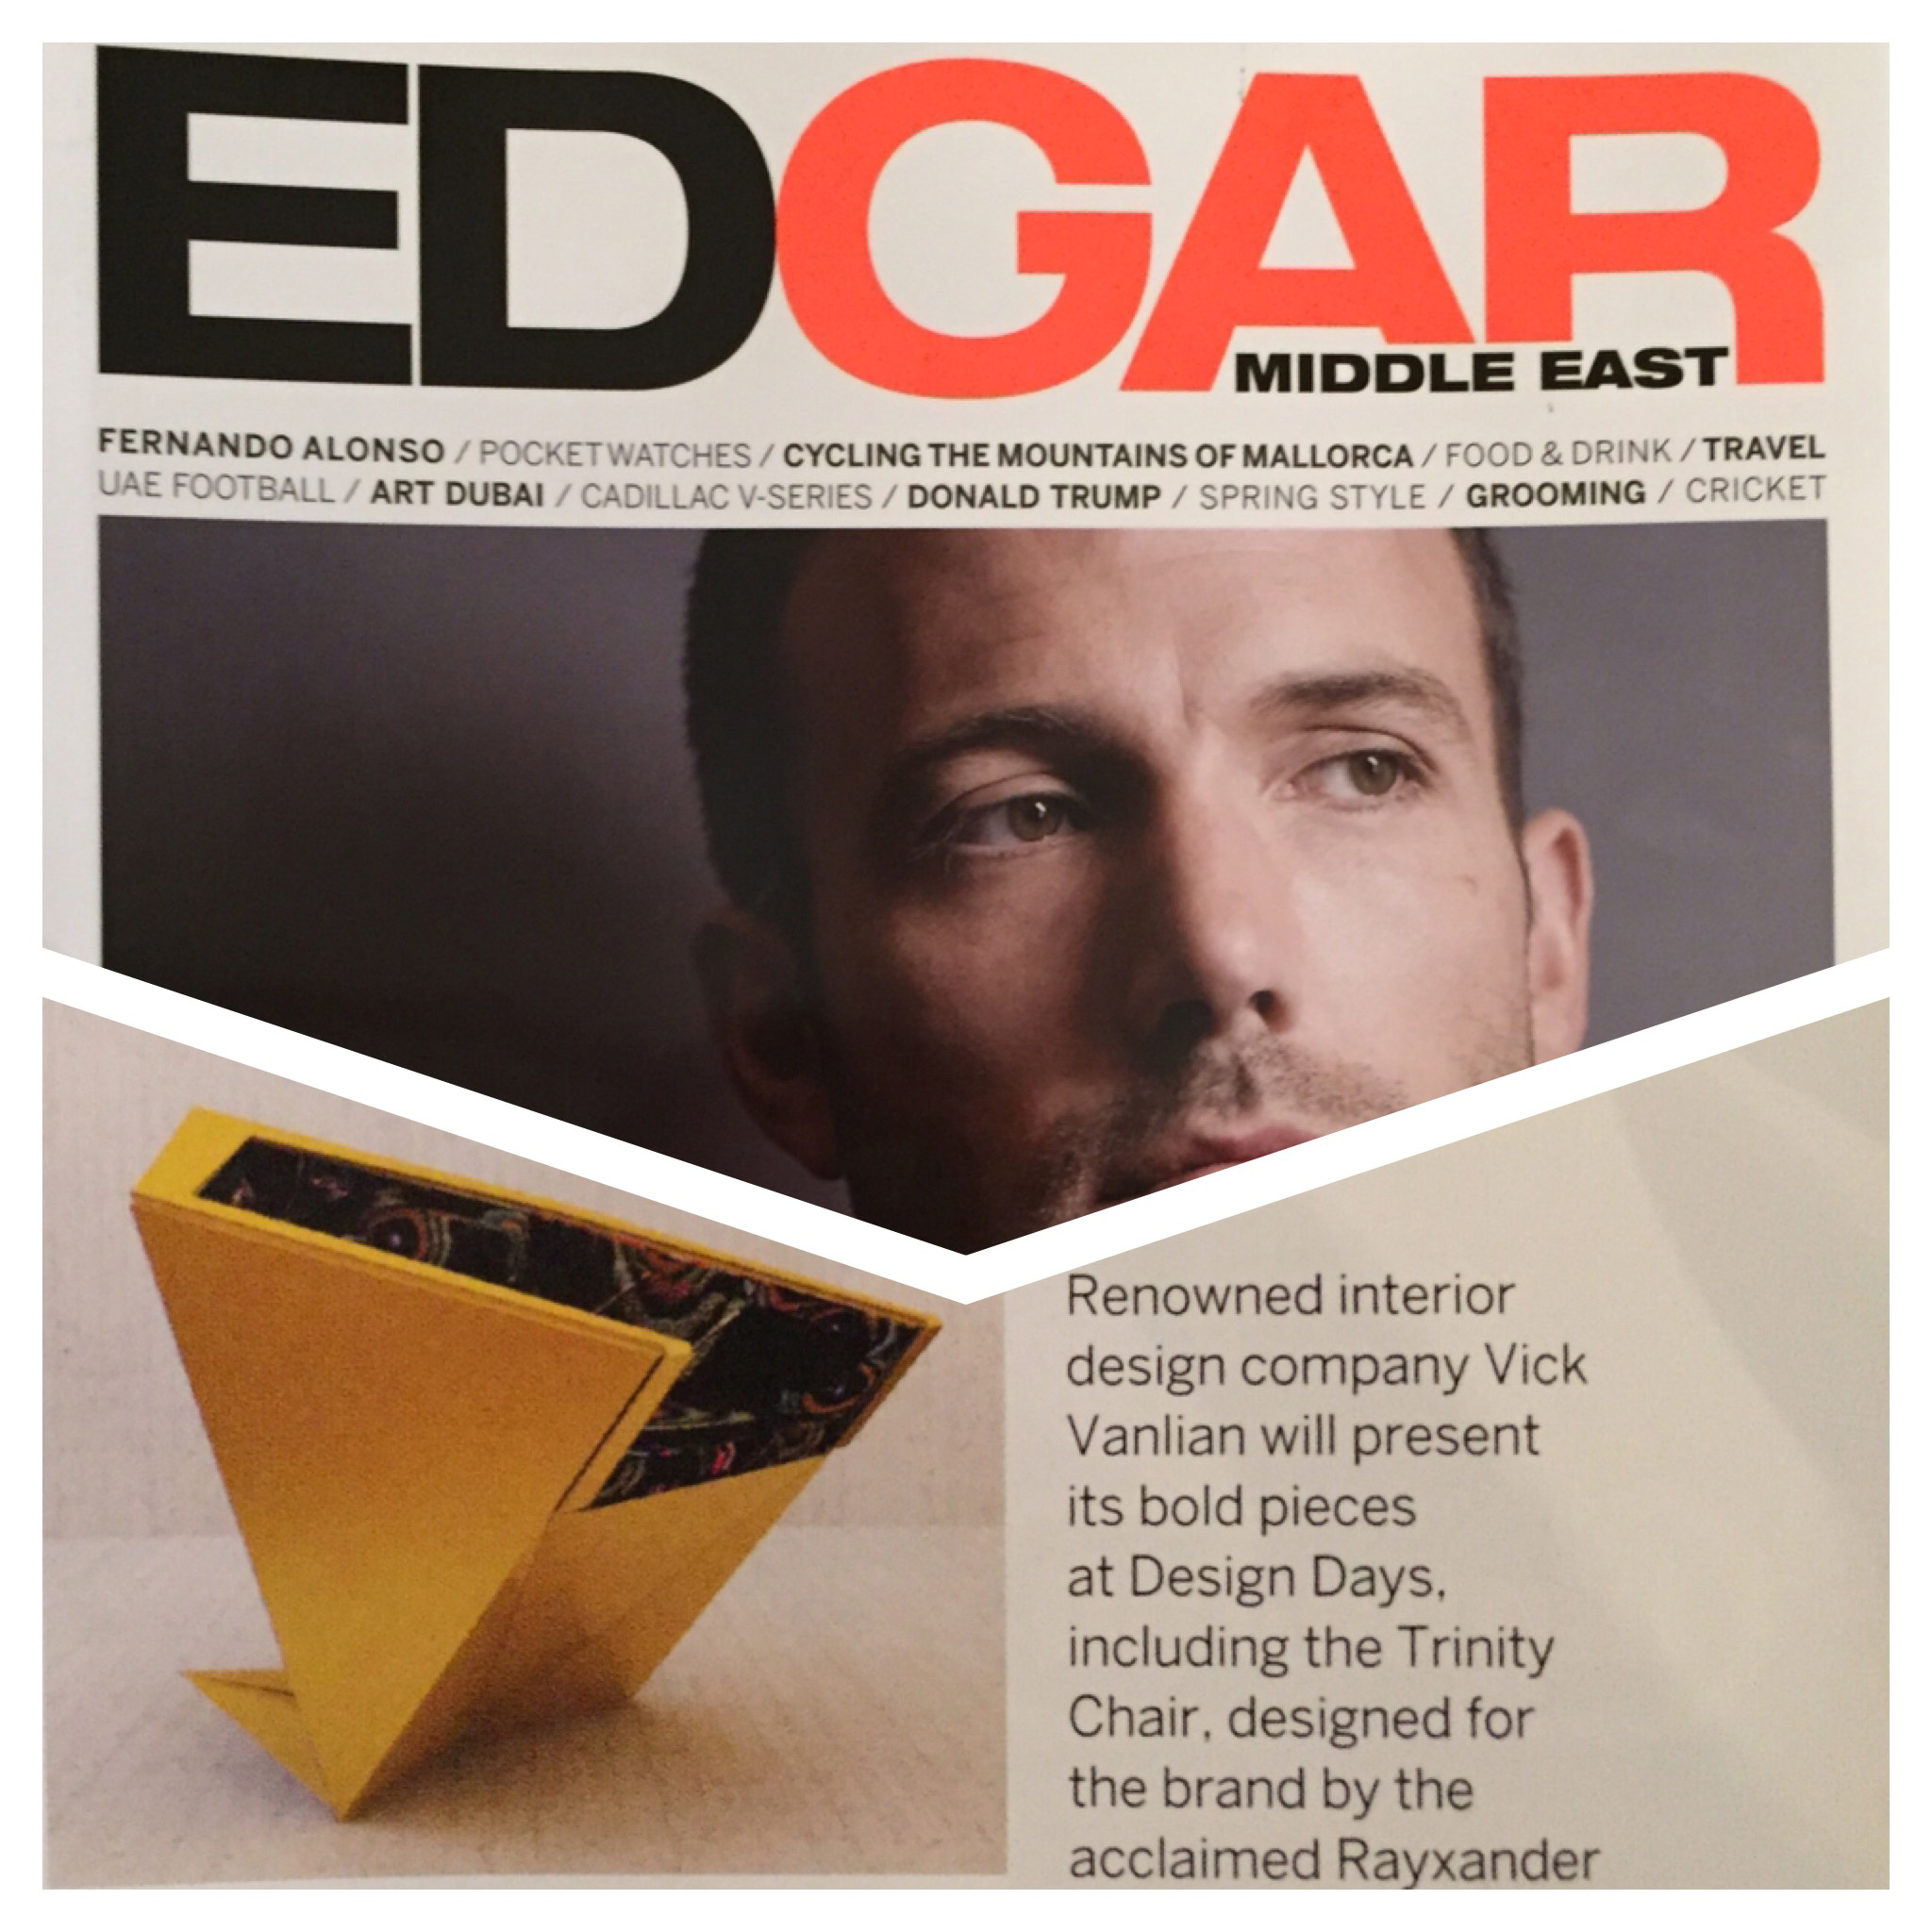 EDGAR-MIDDLE-EAST-2017